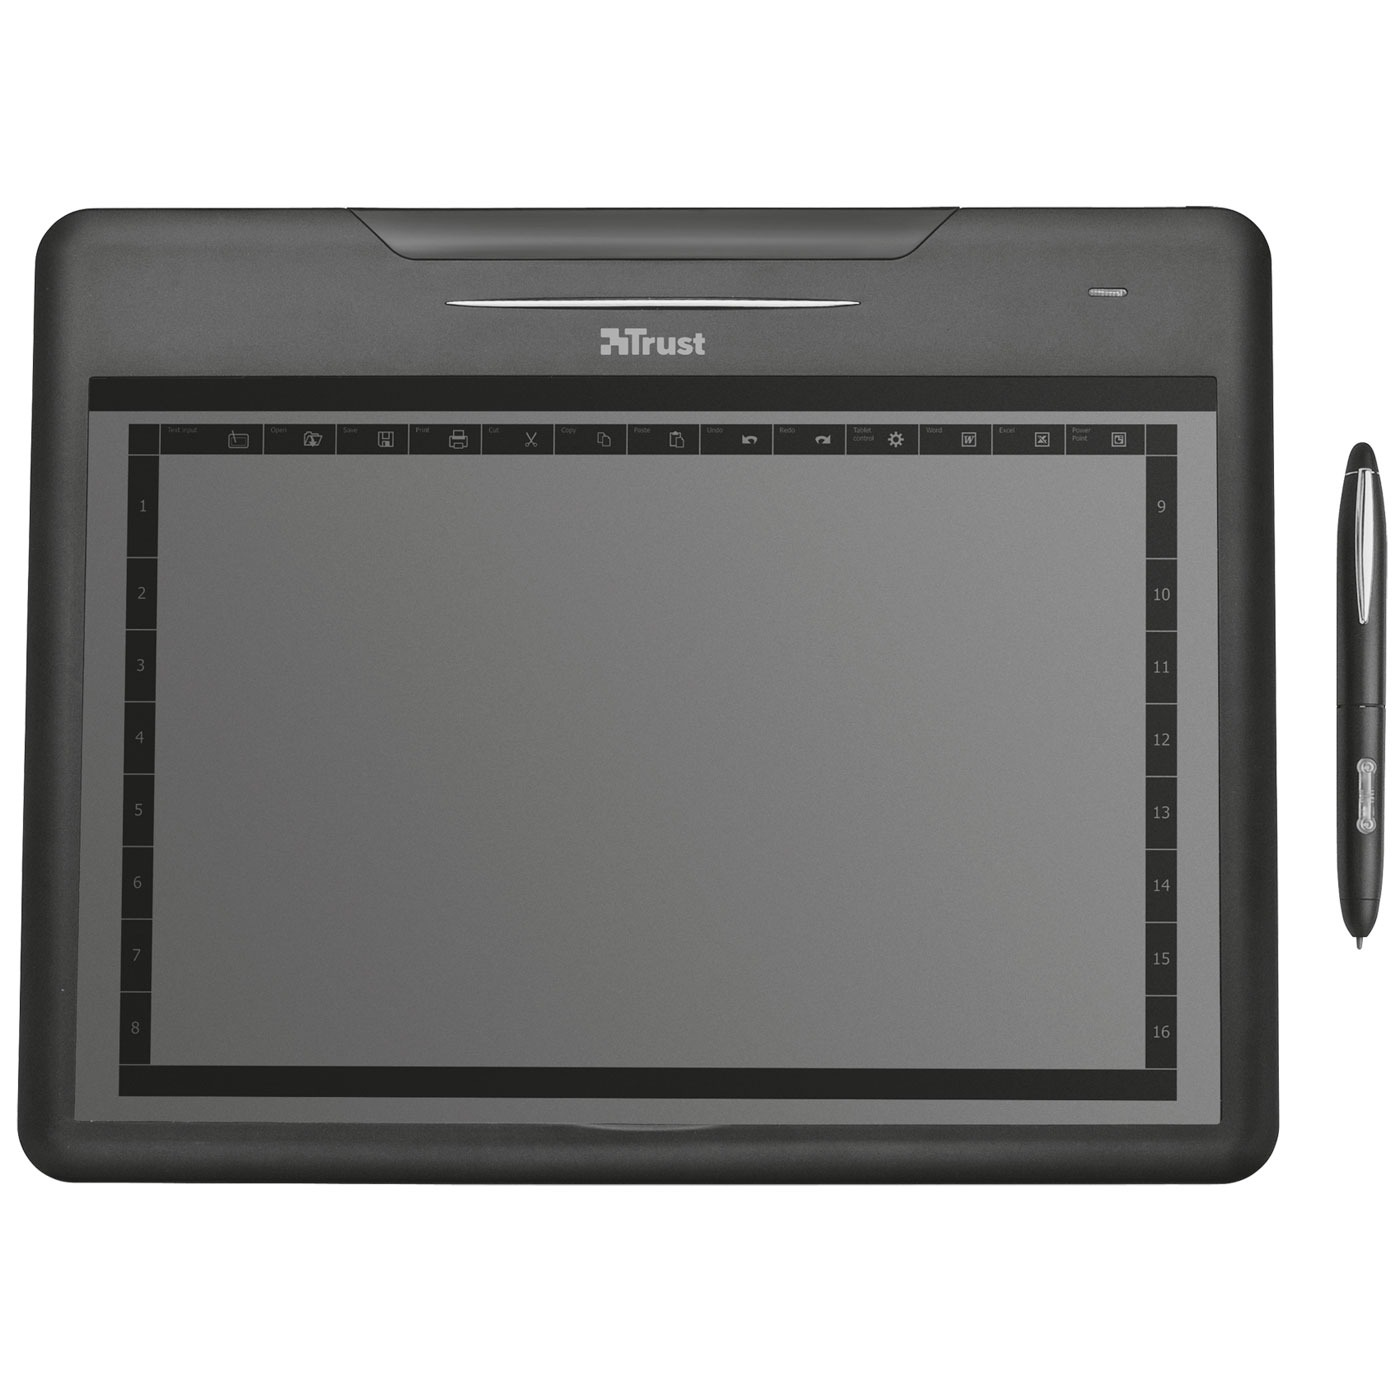 Tablette graphique Trust Slimline Widescreen Tablet Tablette graphique format A5 large (PC)